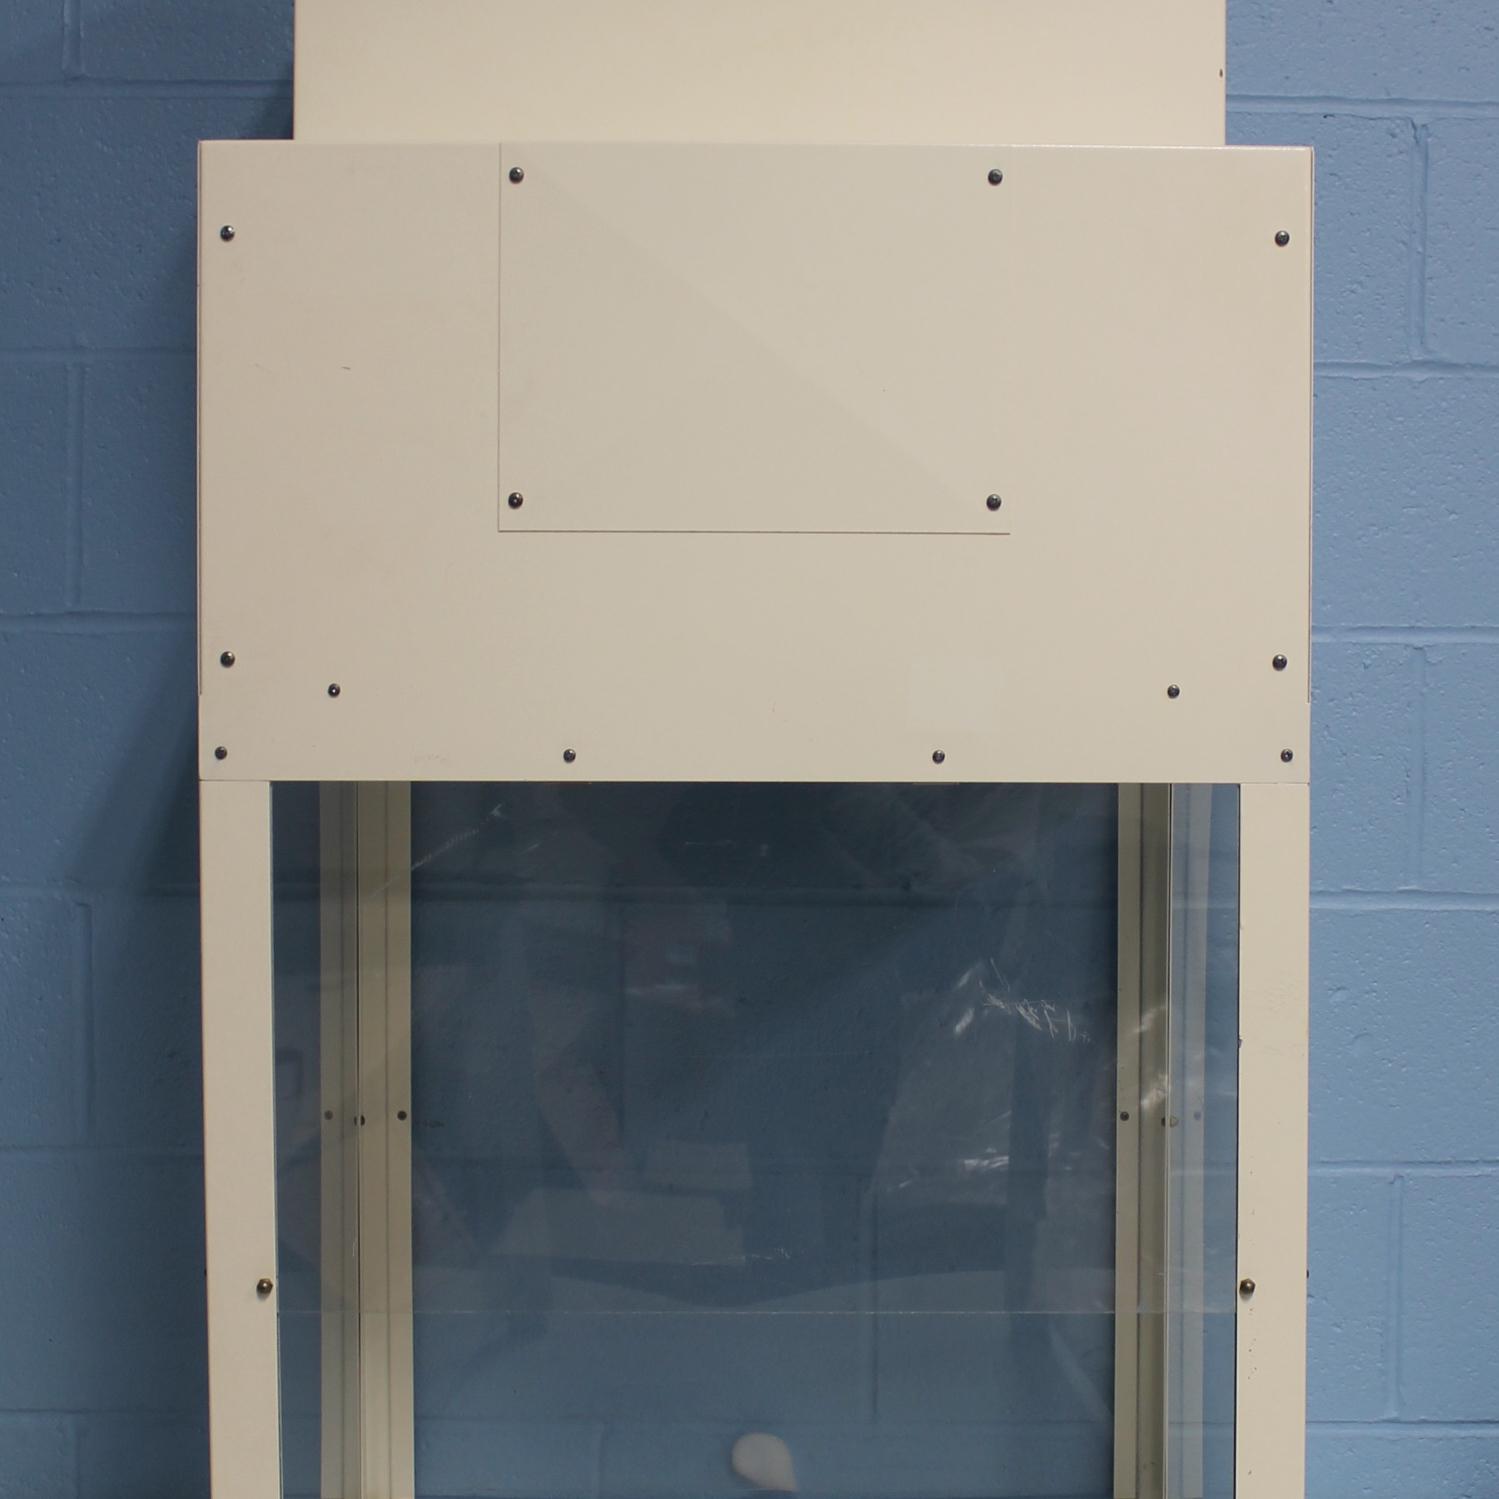 Envirco Laminar Flow Workstation, Model 10557 Image